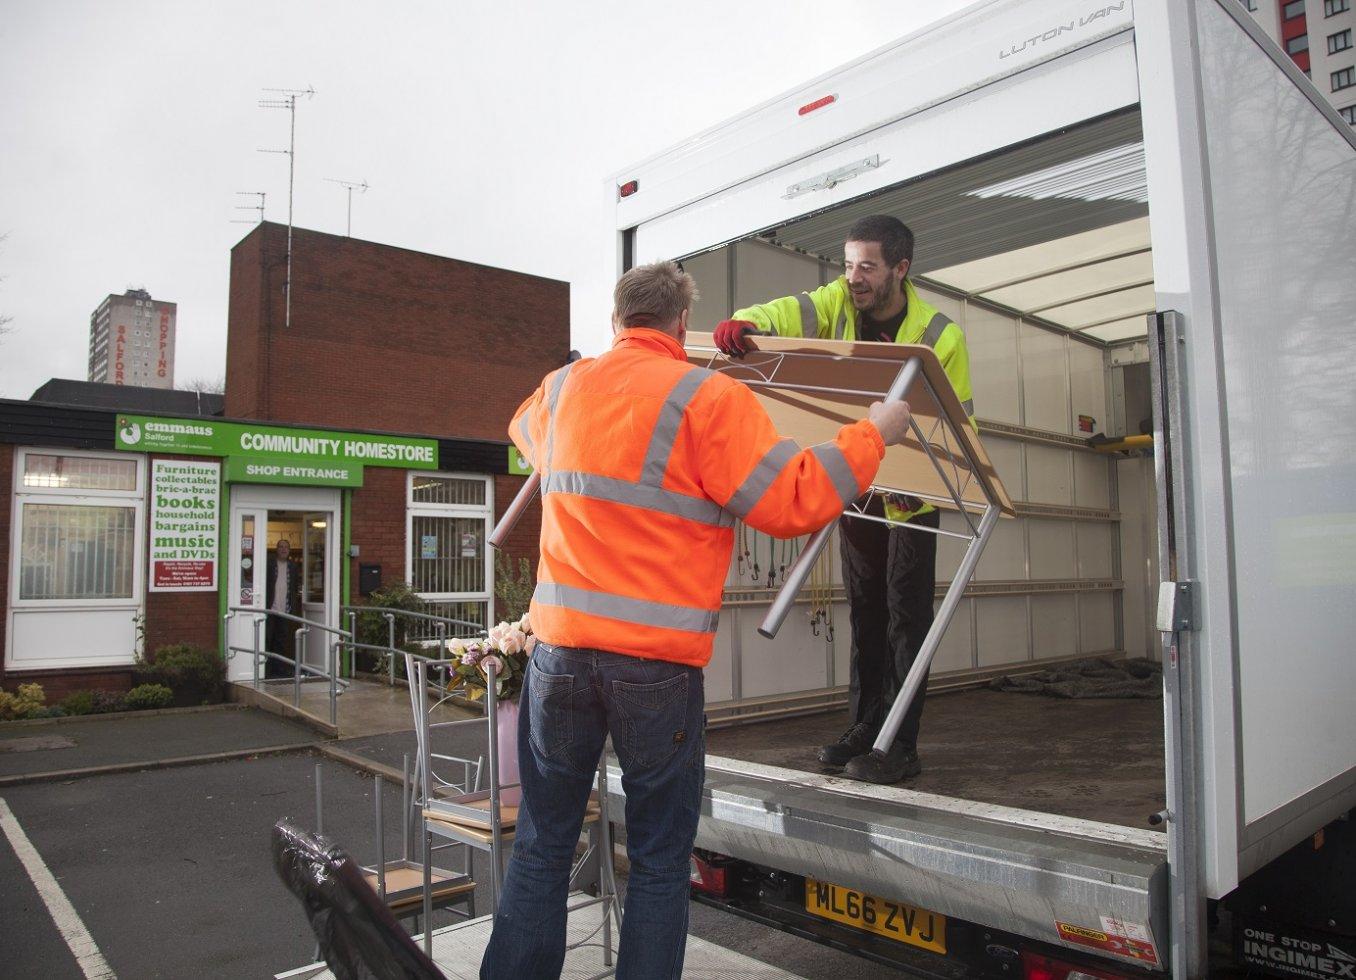 Donating goods to Emmaus Bradford